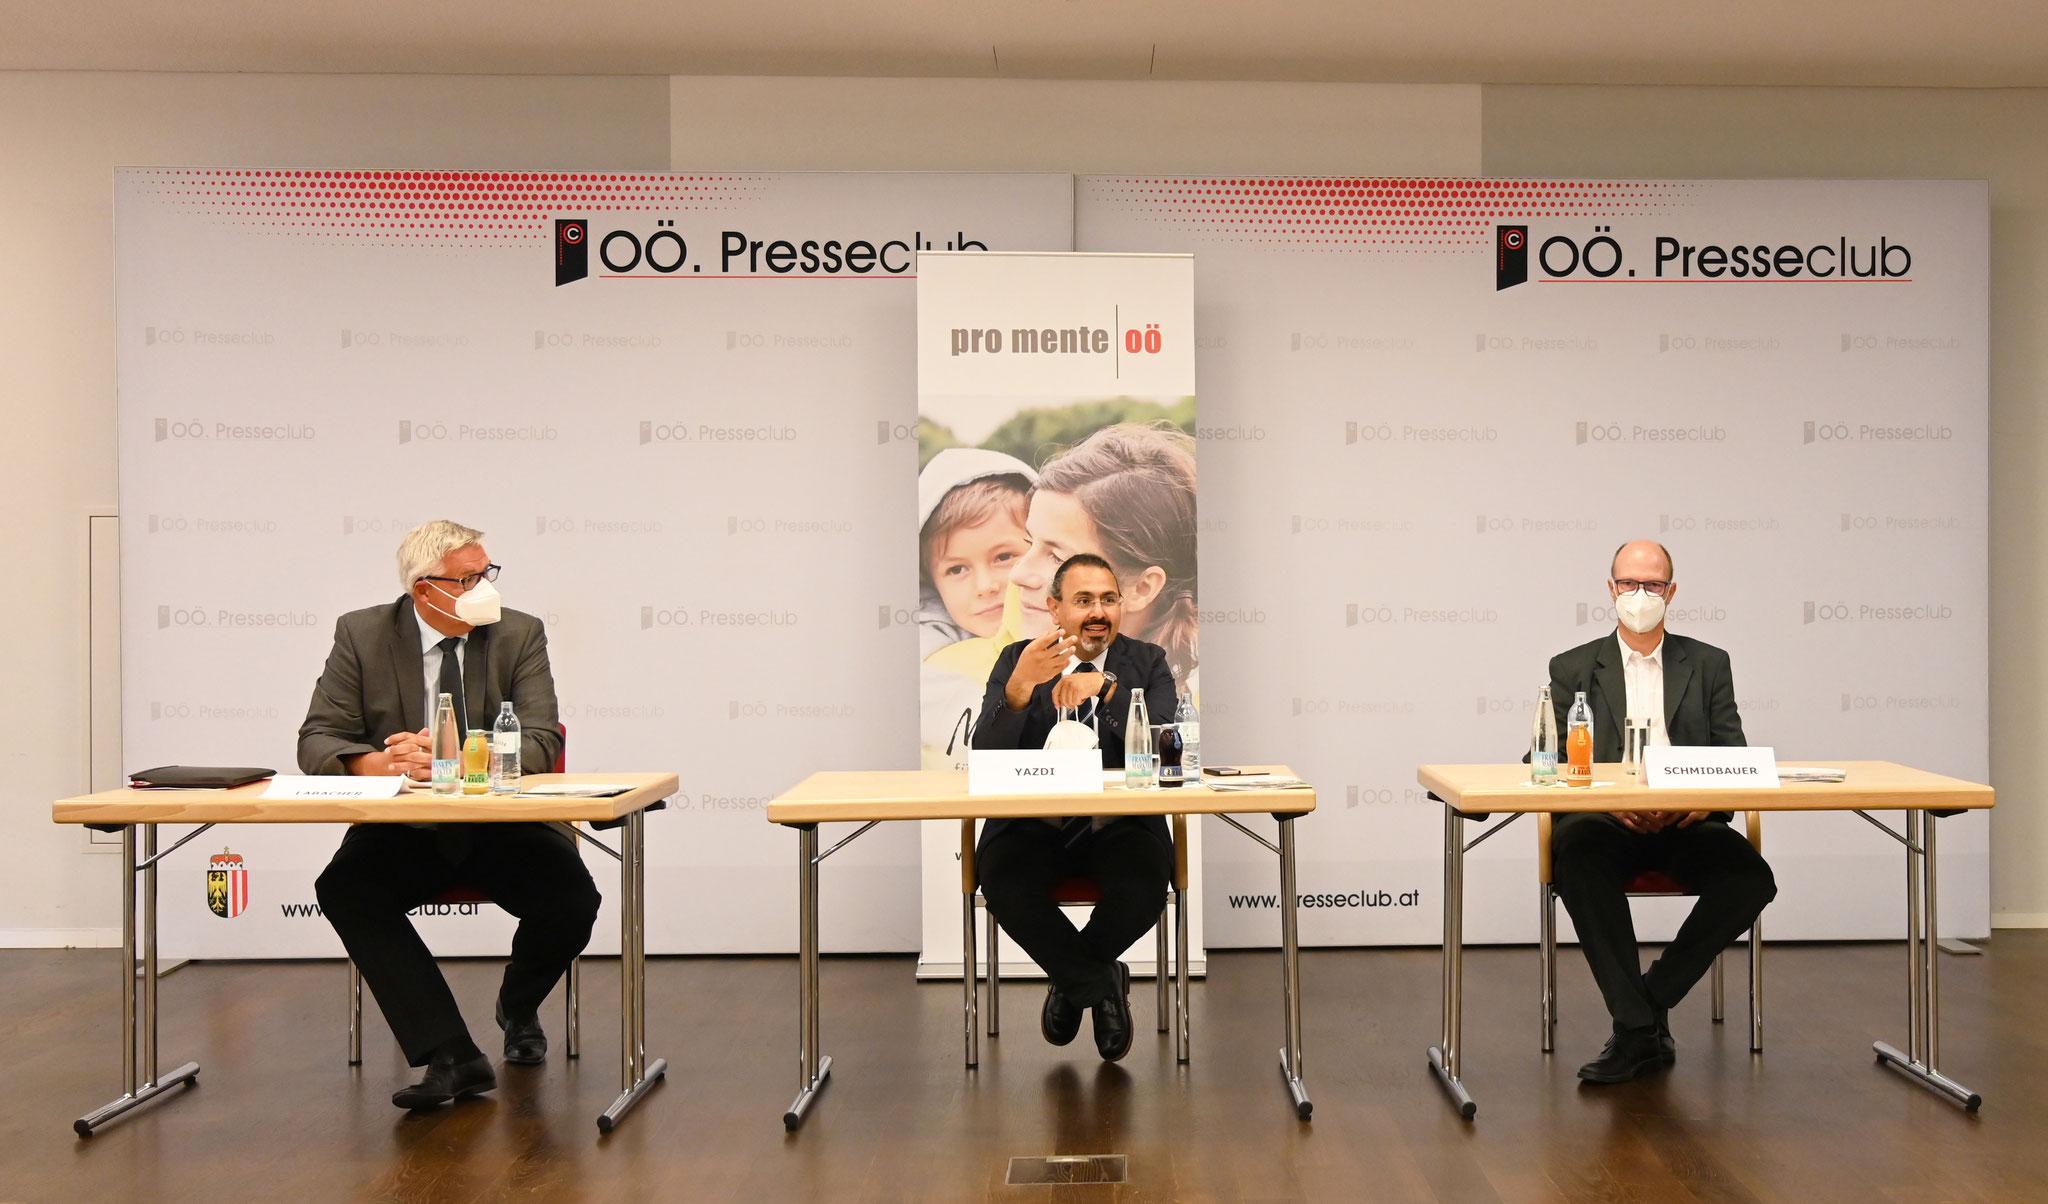 Pressekonferenz (v.l.n.r.: Labacher, Yazdi, Schmidbauer)